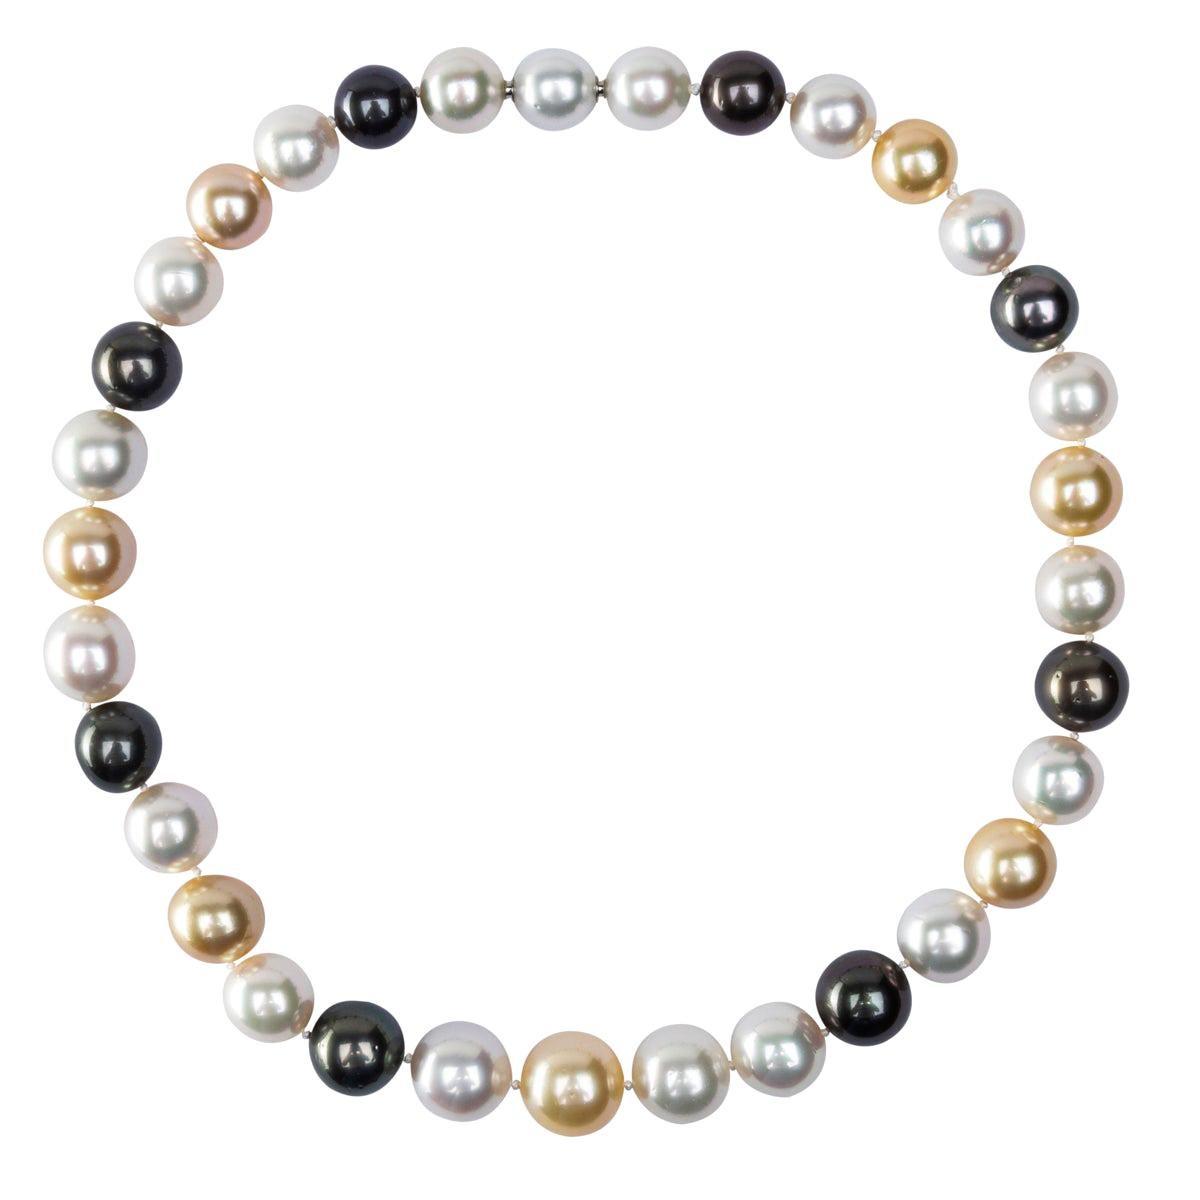 Alex Jona Multicolor South Sea and Tahiti Pearl Necklace